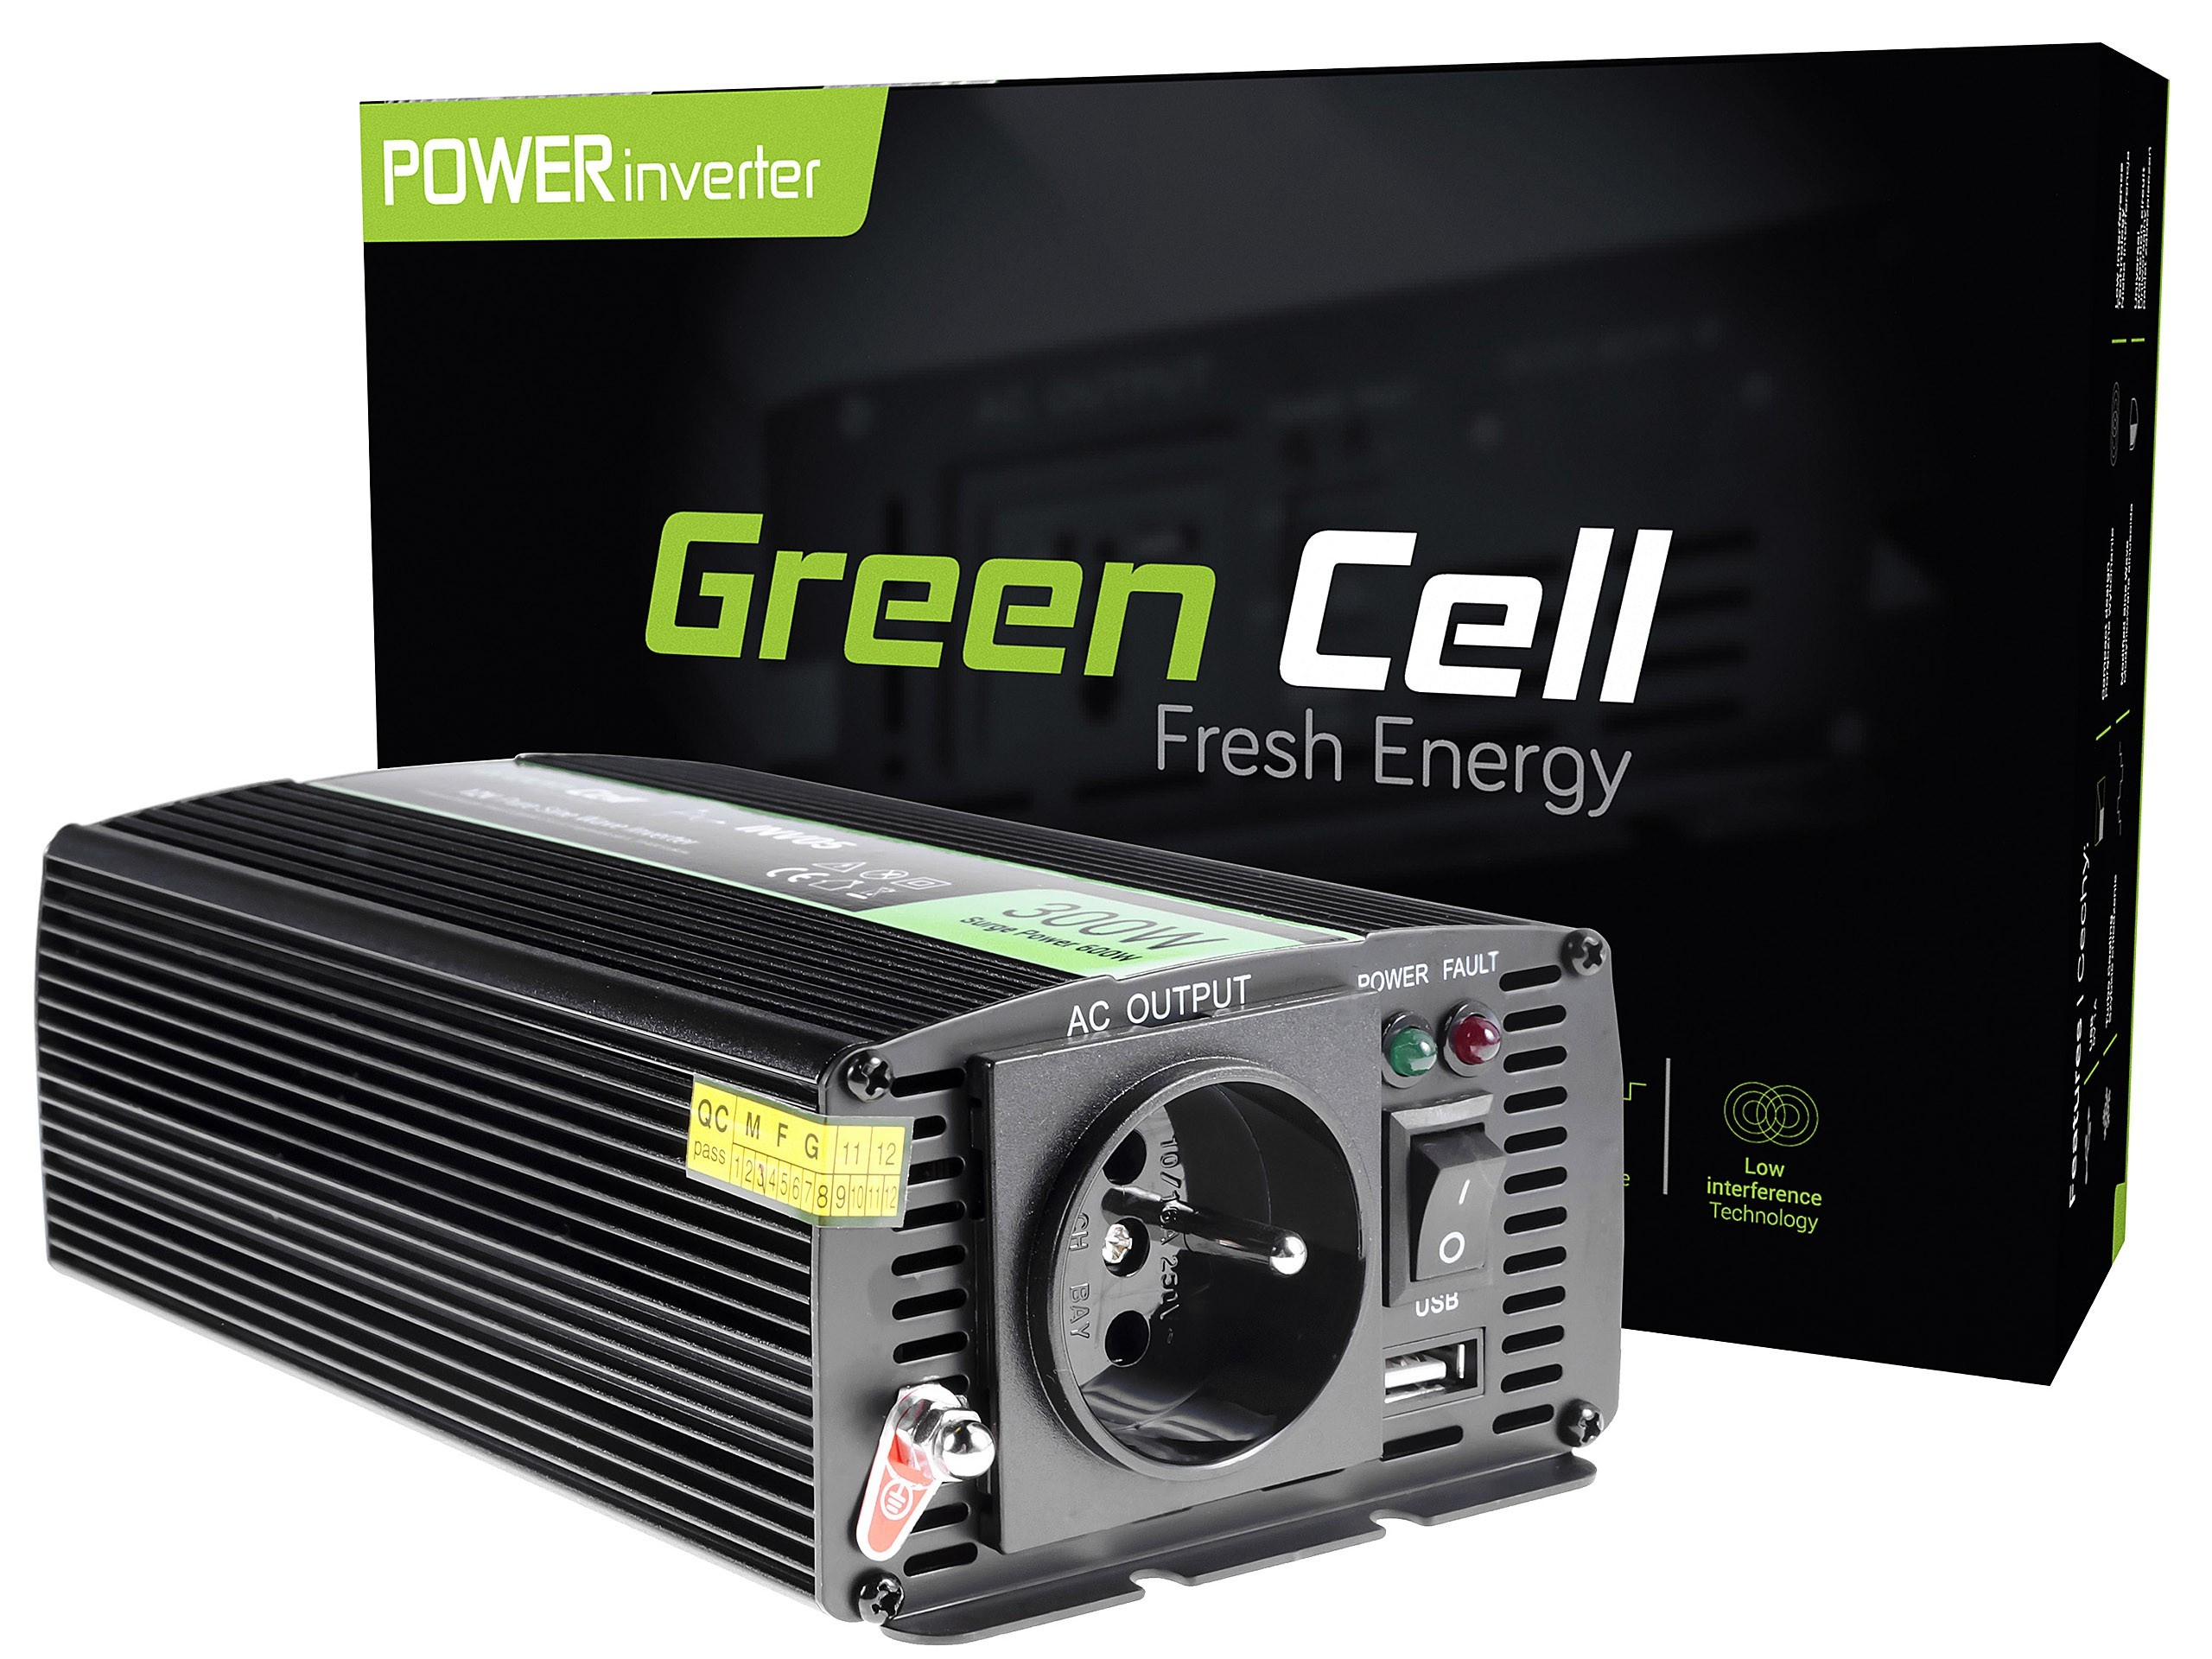 Měnič napětí Green Cell 12V na 230V, 300W | 600W - Čistá sinusovka